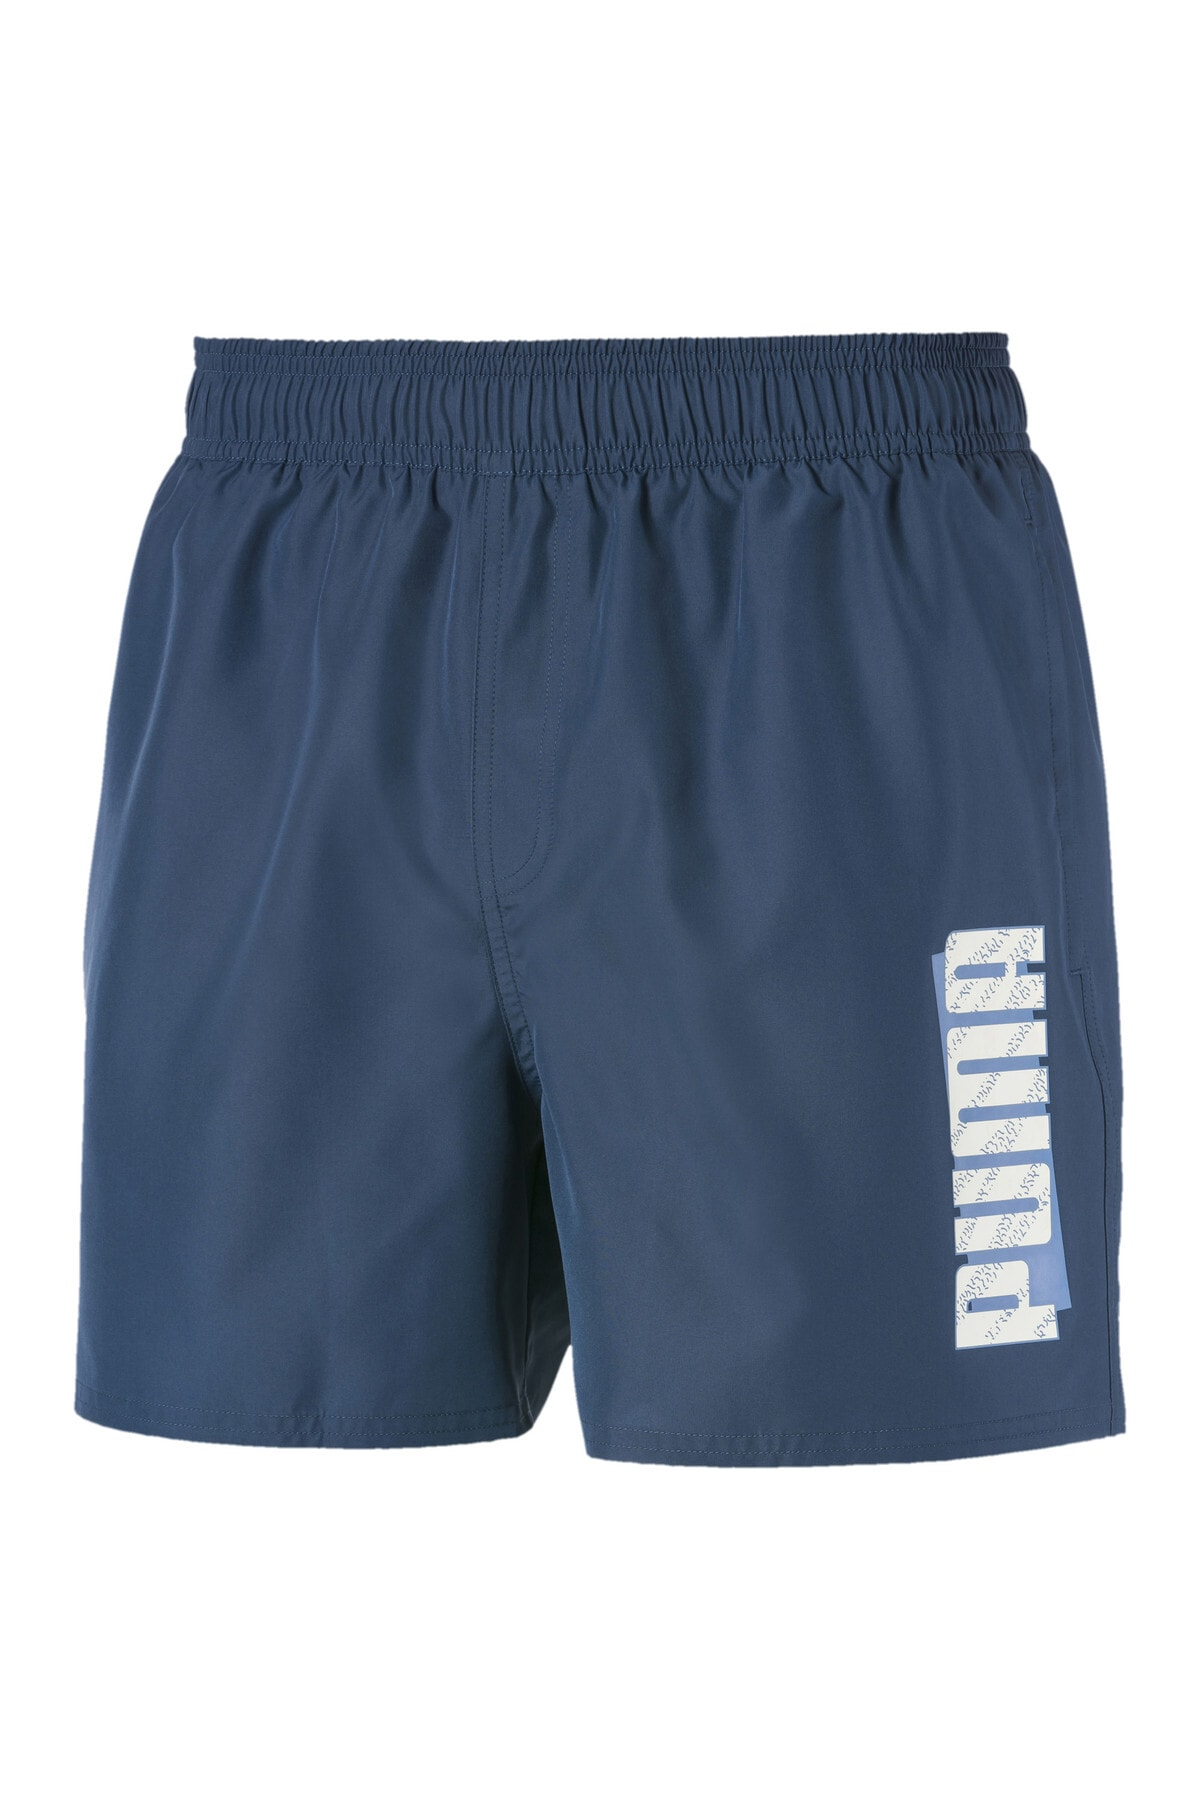 Puma Ess- Summer Shorts Dark Denım